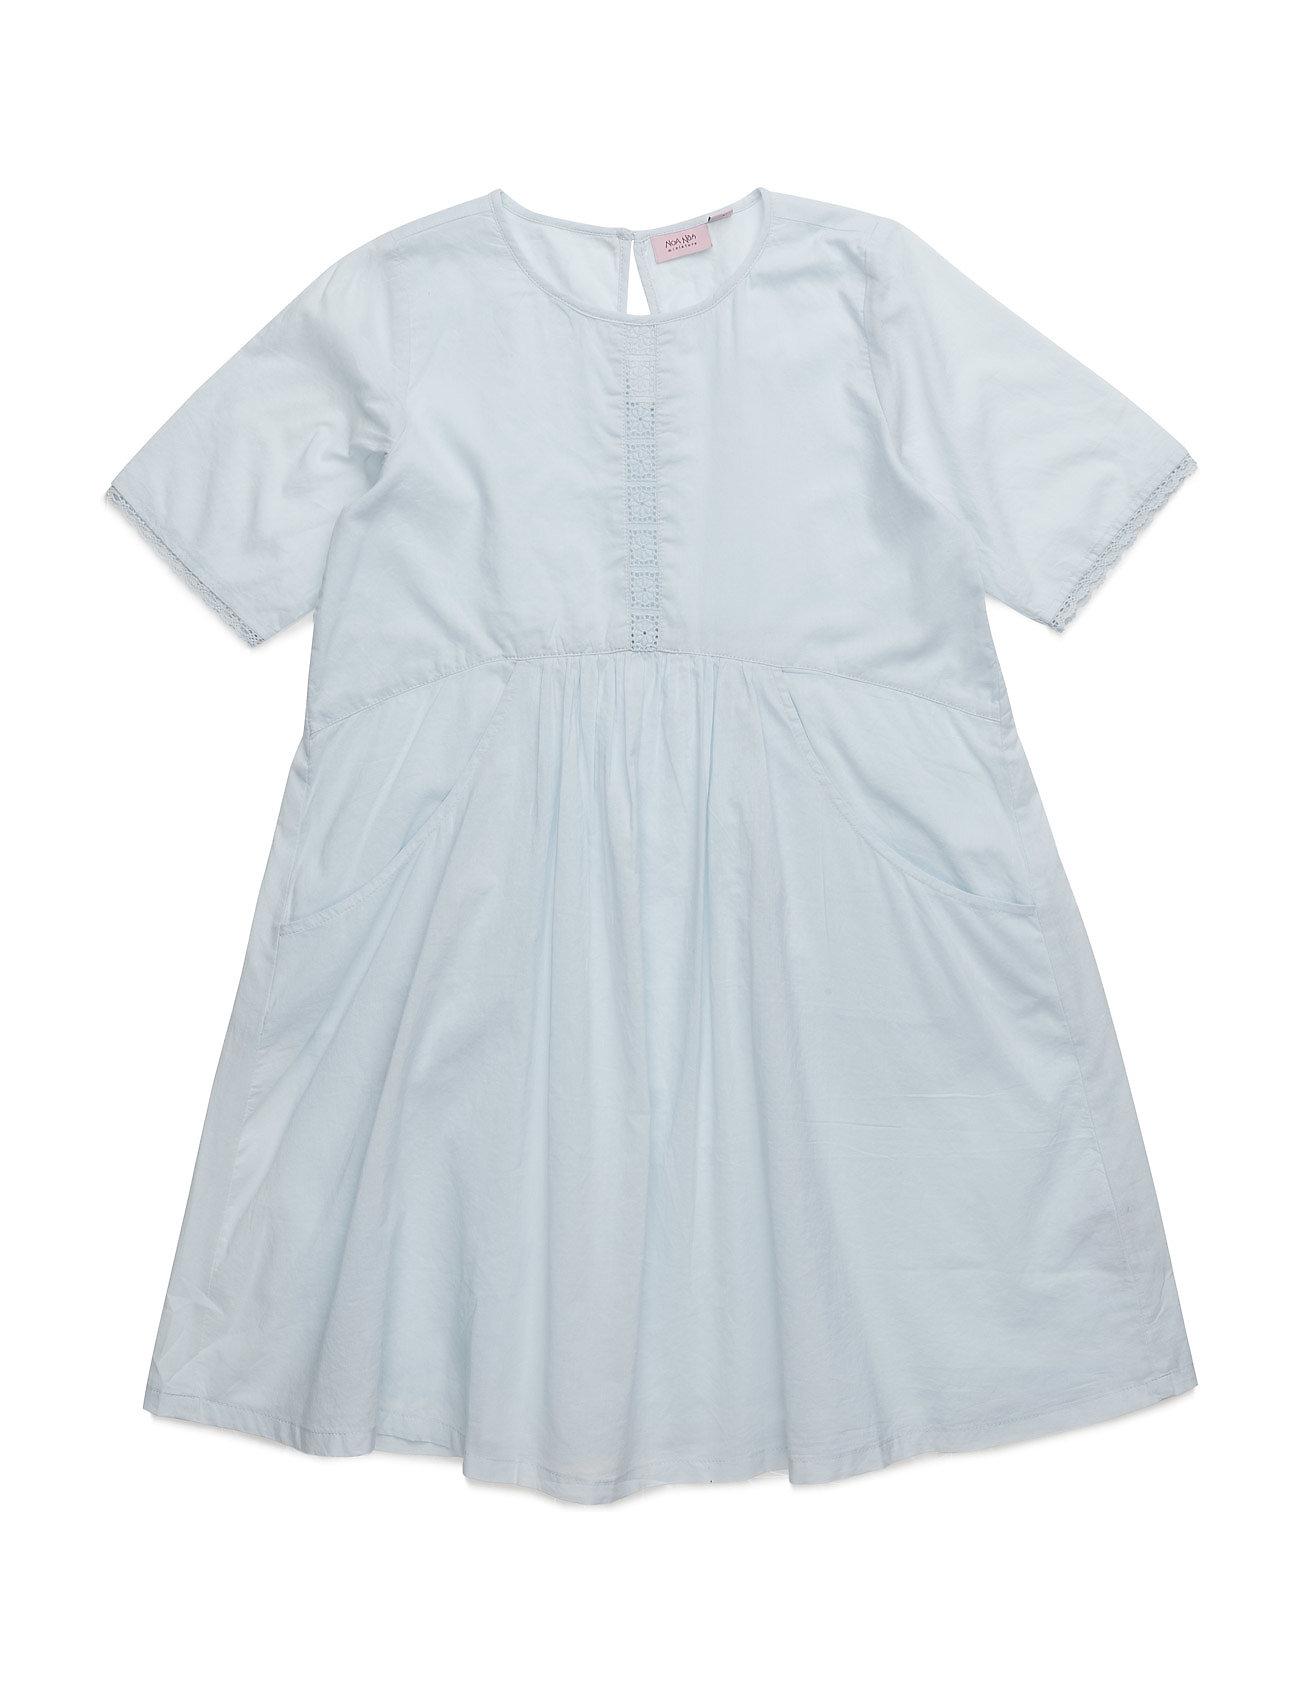 Dress Short Sleeve Noa Noa Miniature Kjoler til Børn i